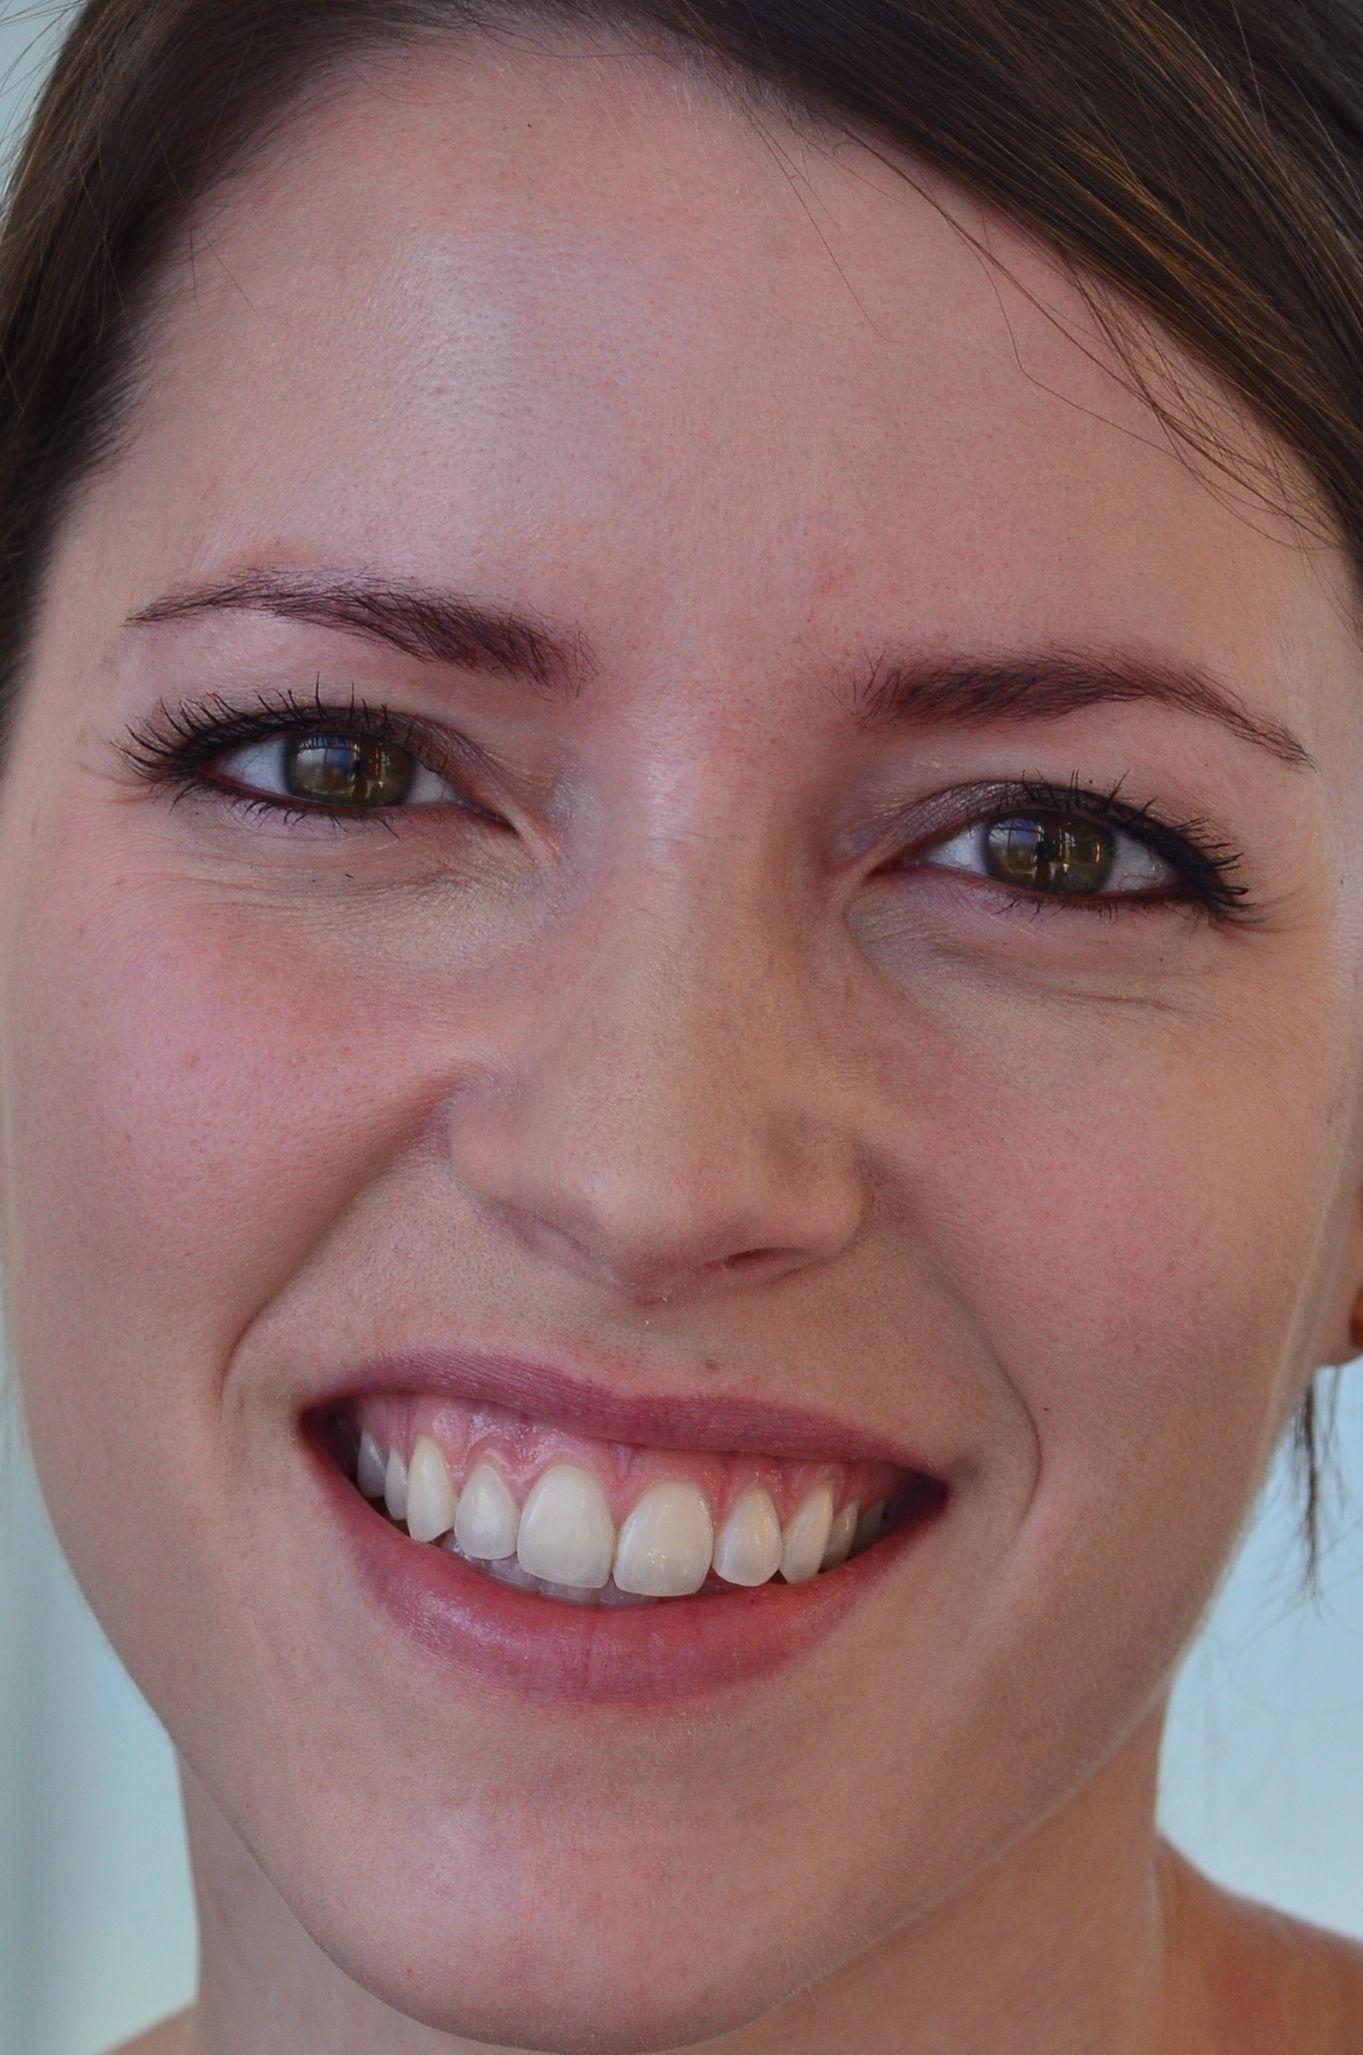 Alicia Brandt,Rie Tomosaka Porno photos Stacey Grenrock-Woods,Jennifer Black